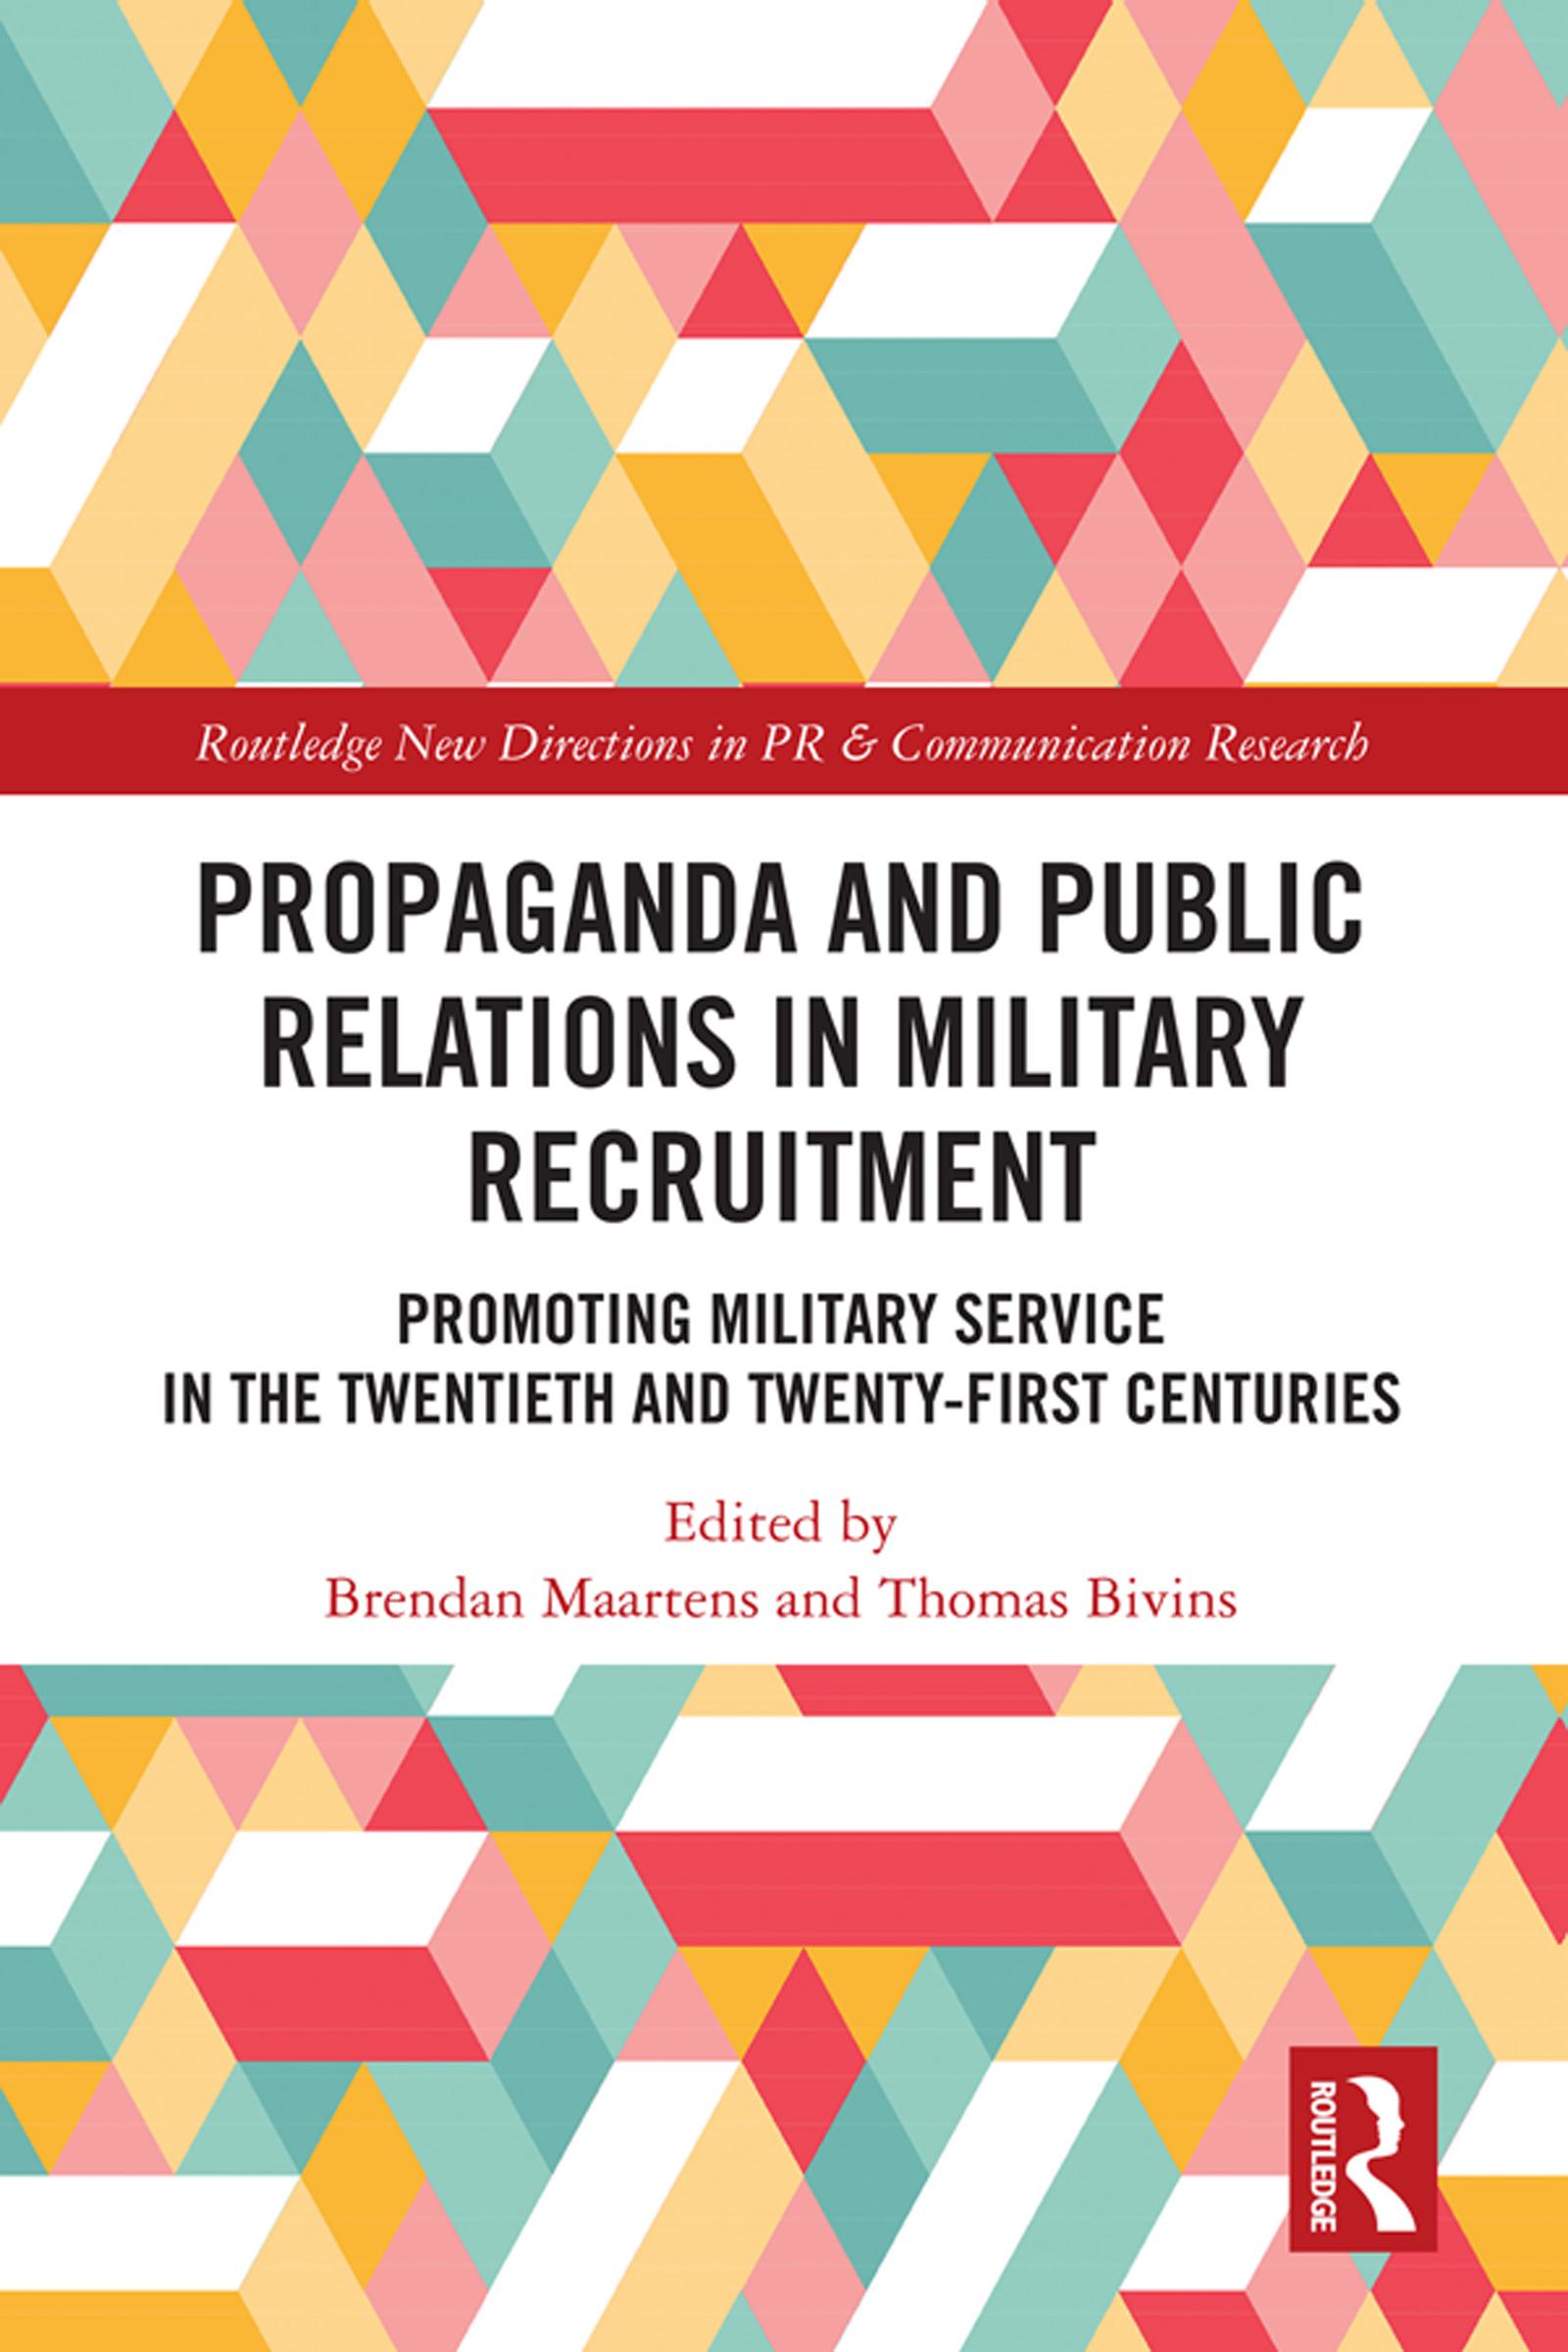 Propaganda and Public Relations in Military Recruitment